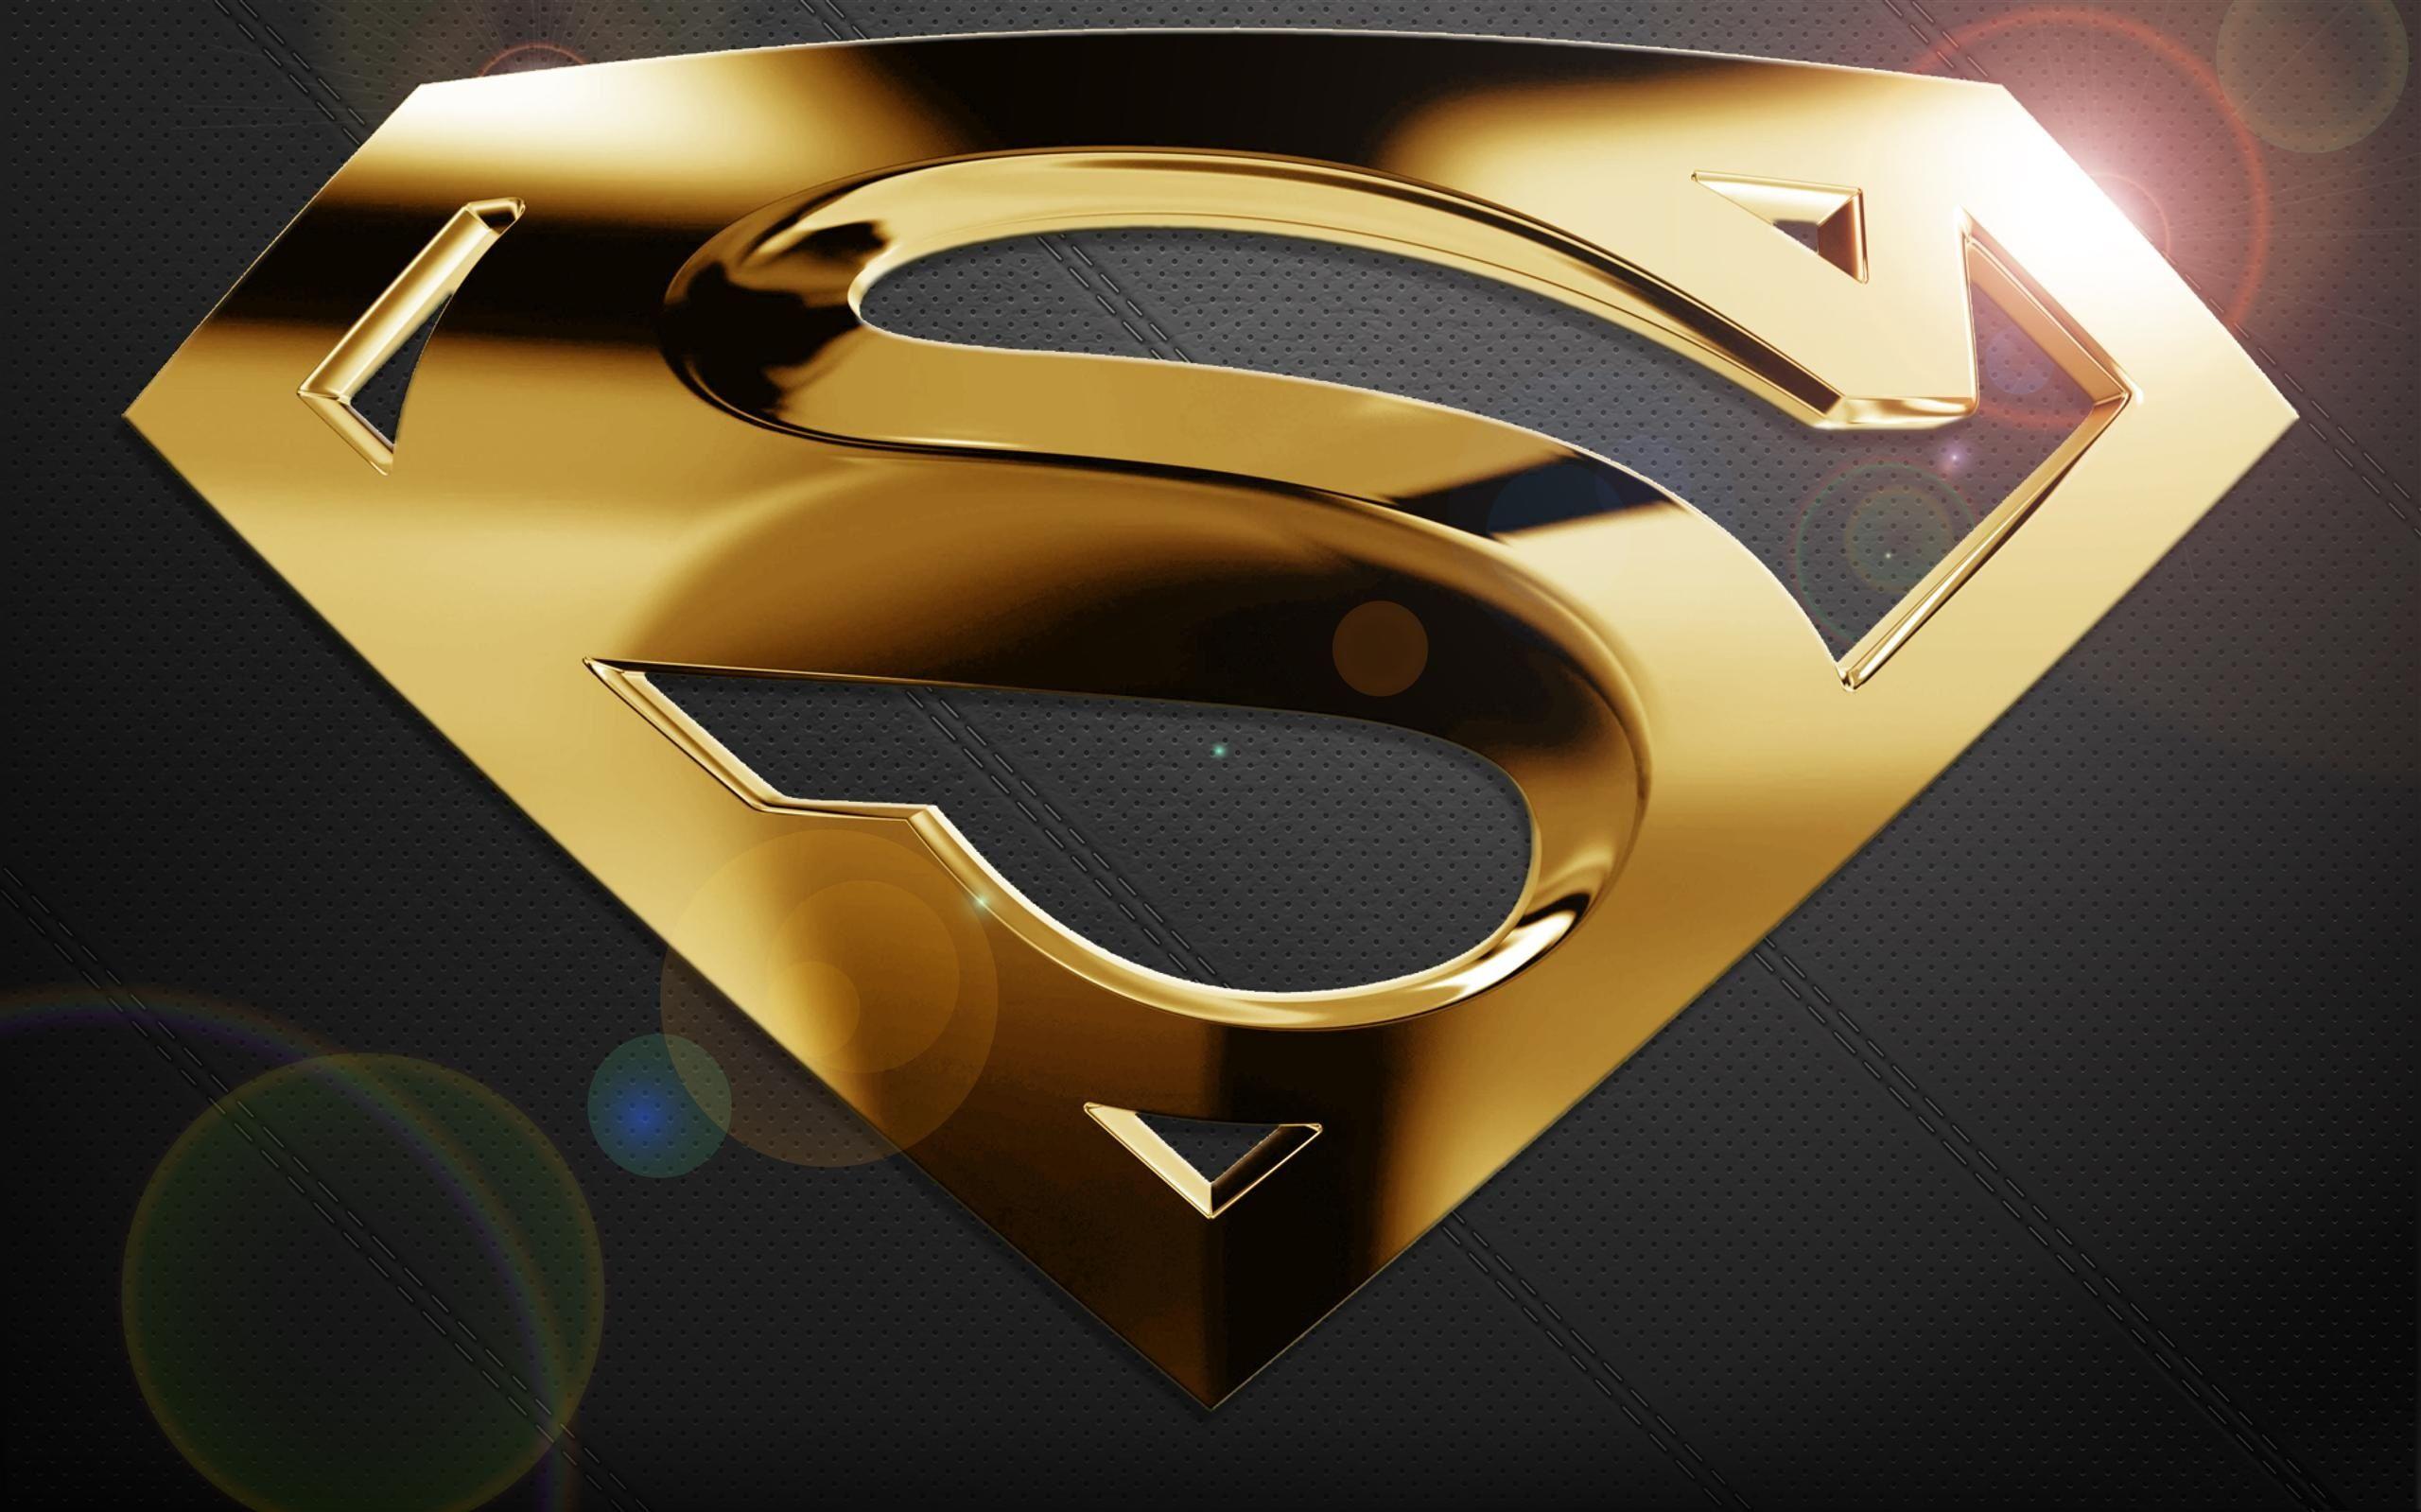 Superman Logo Desktop Hd Hd 1080p Jpg 2560 1599 Superman Fondos De Pantalla Logo Superman Fondos De Pantalla